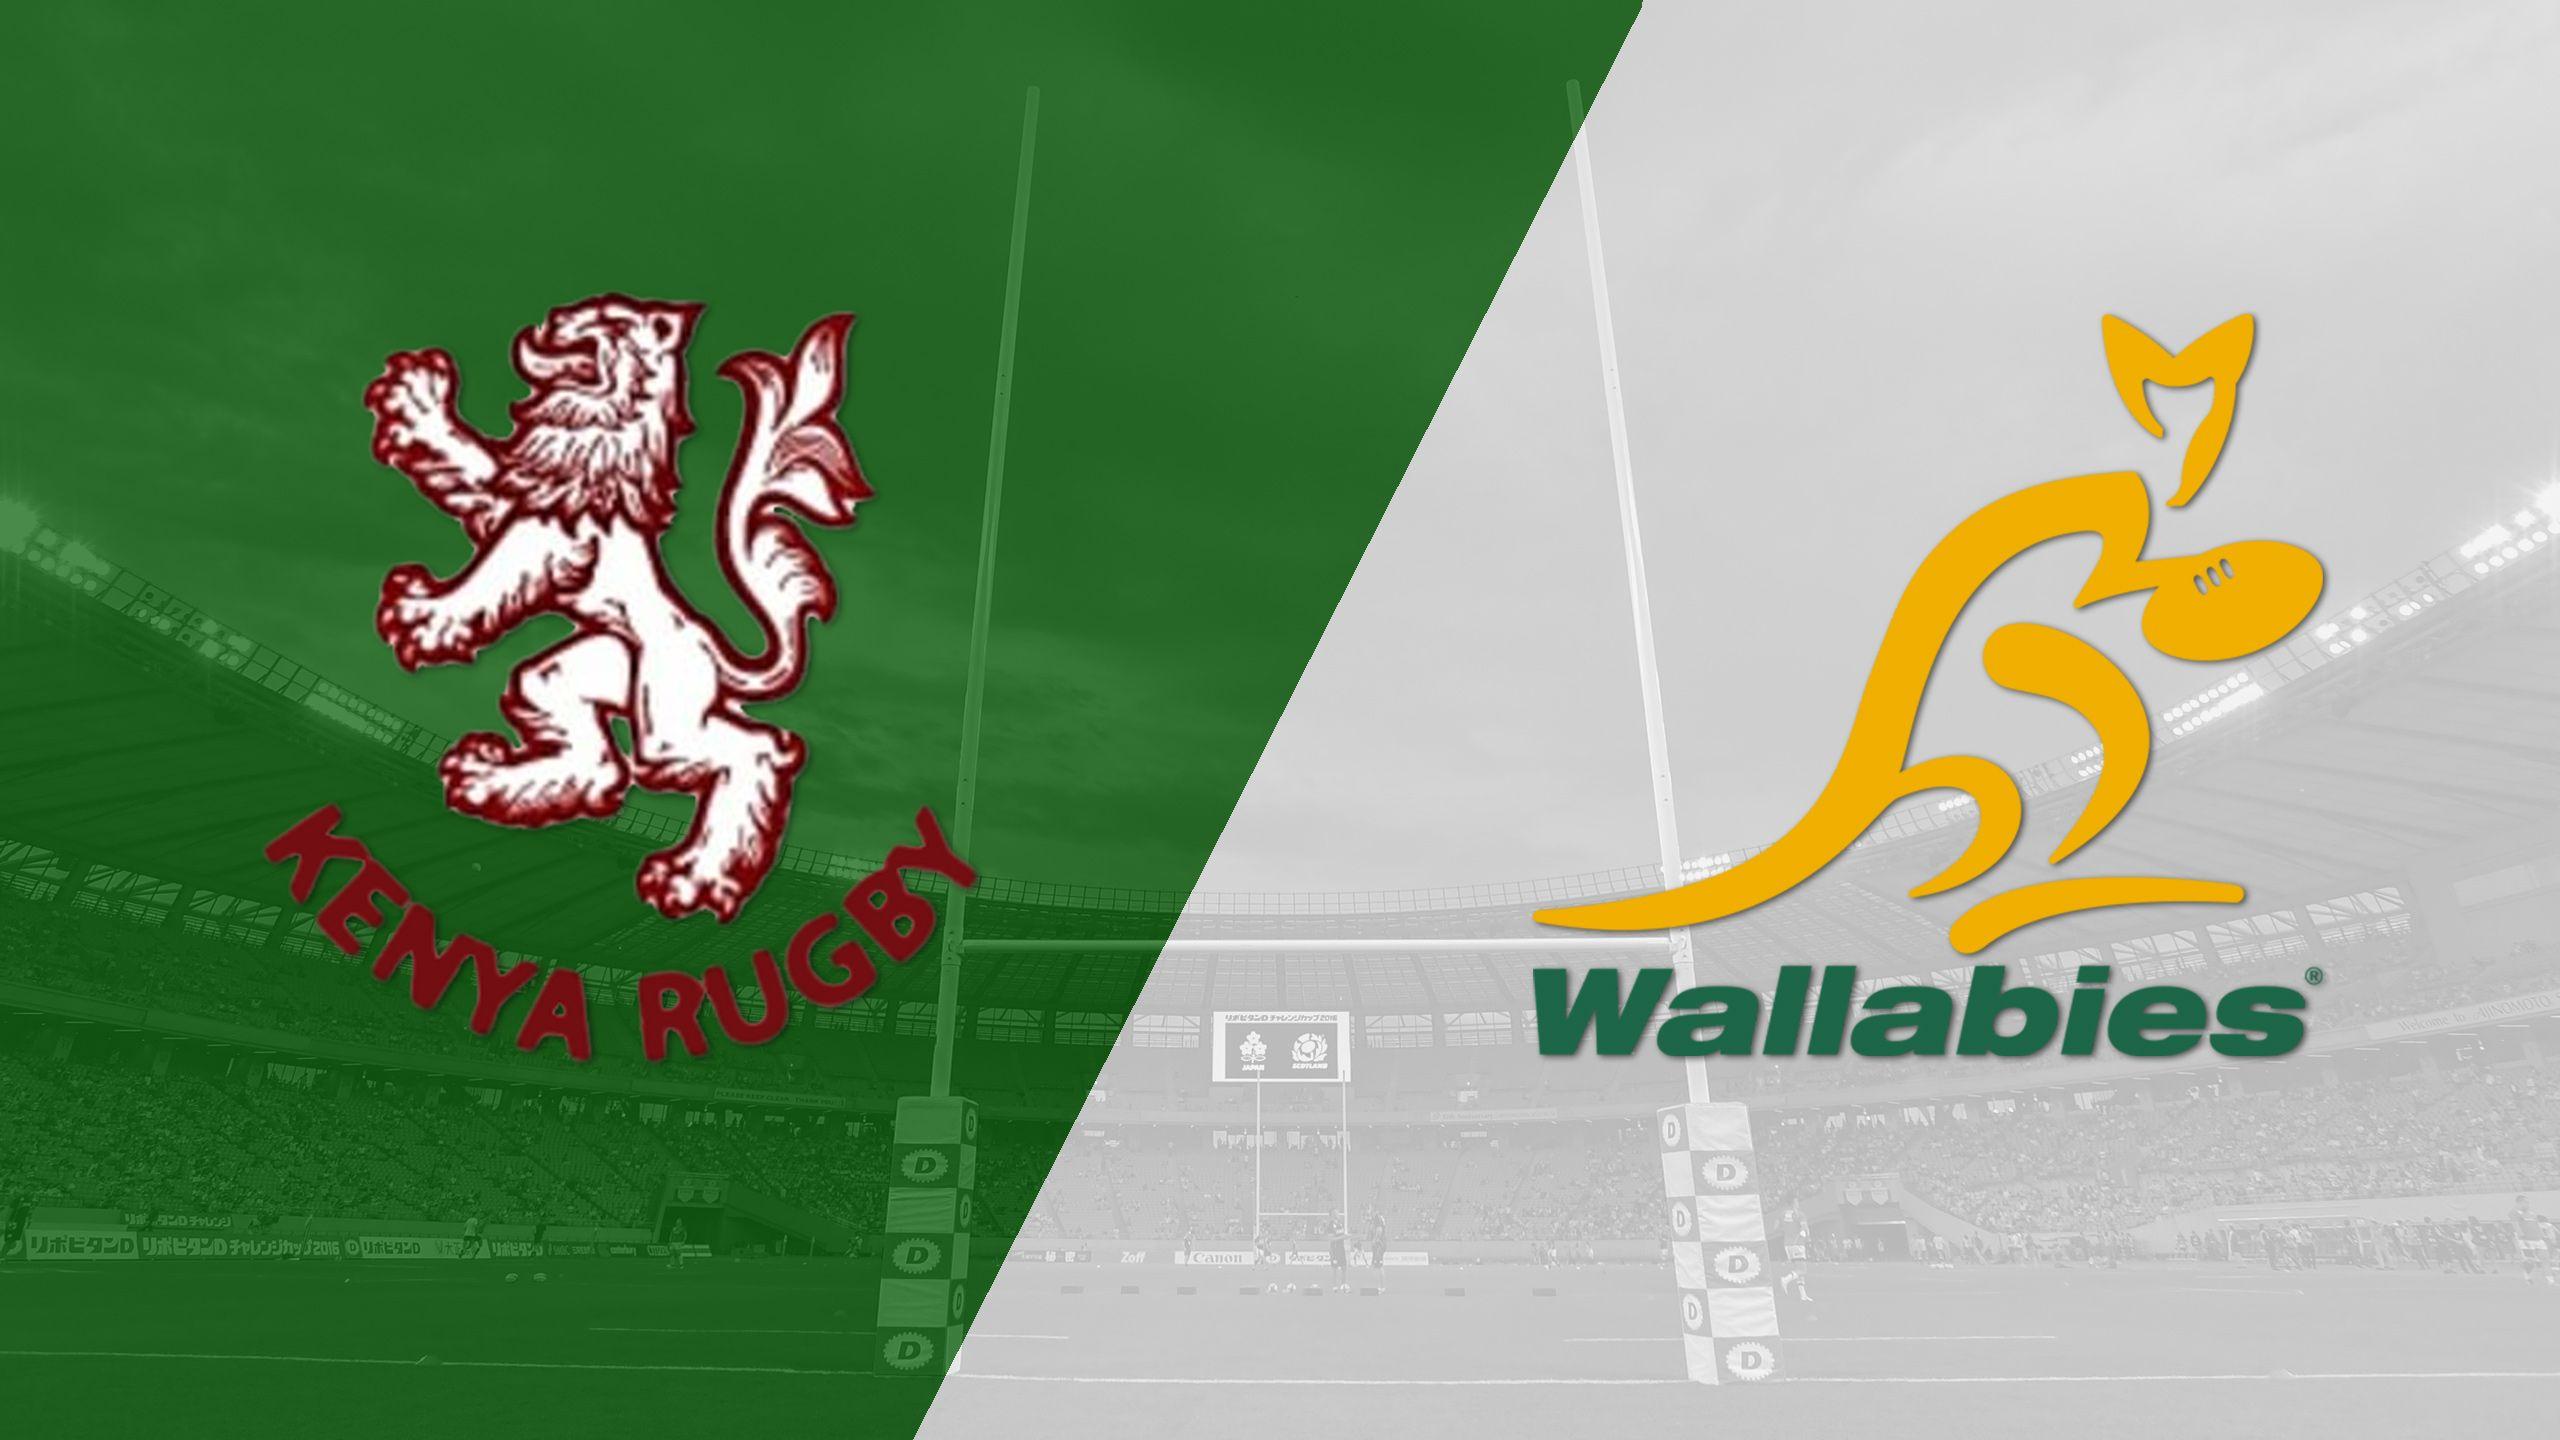 Kenya vs. Australia (Cup Quarter Finals) (World Rugby Sevens Series)